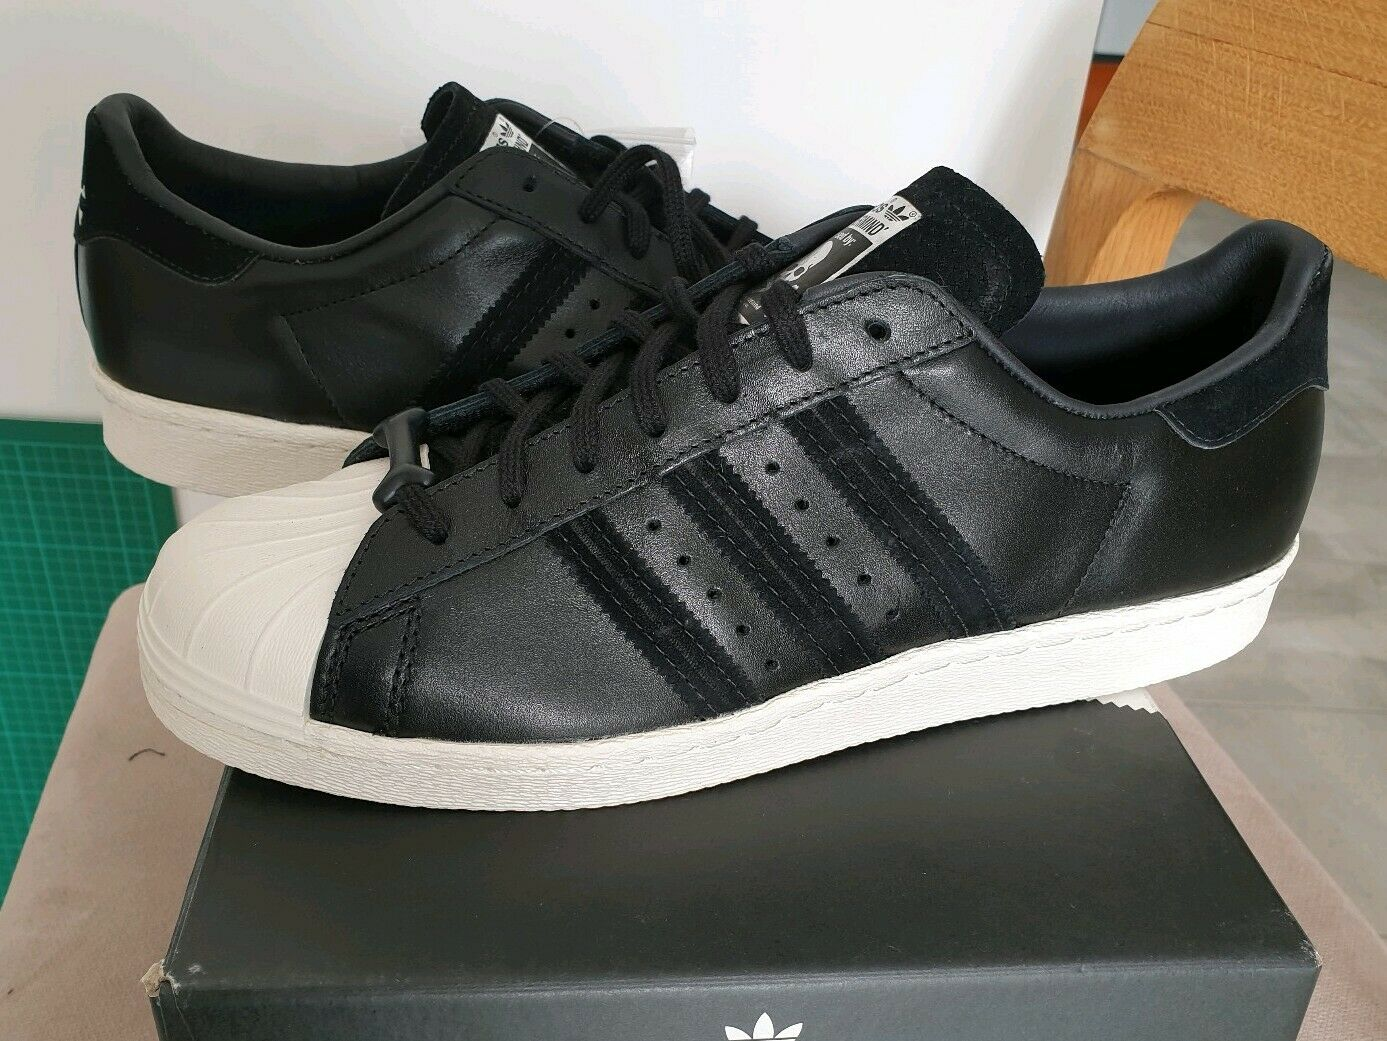 Mastermind Japan x Adidas Superstar 80s nero bianca 9.5 stan smith boost